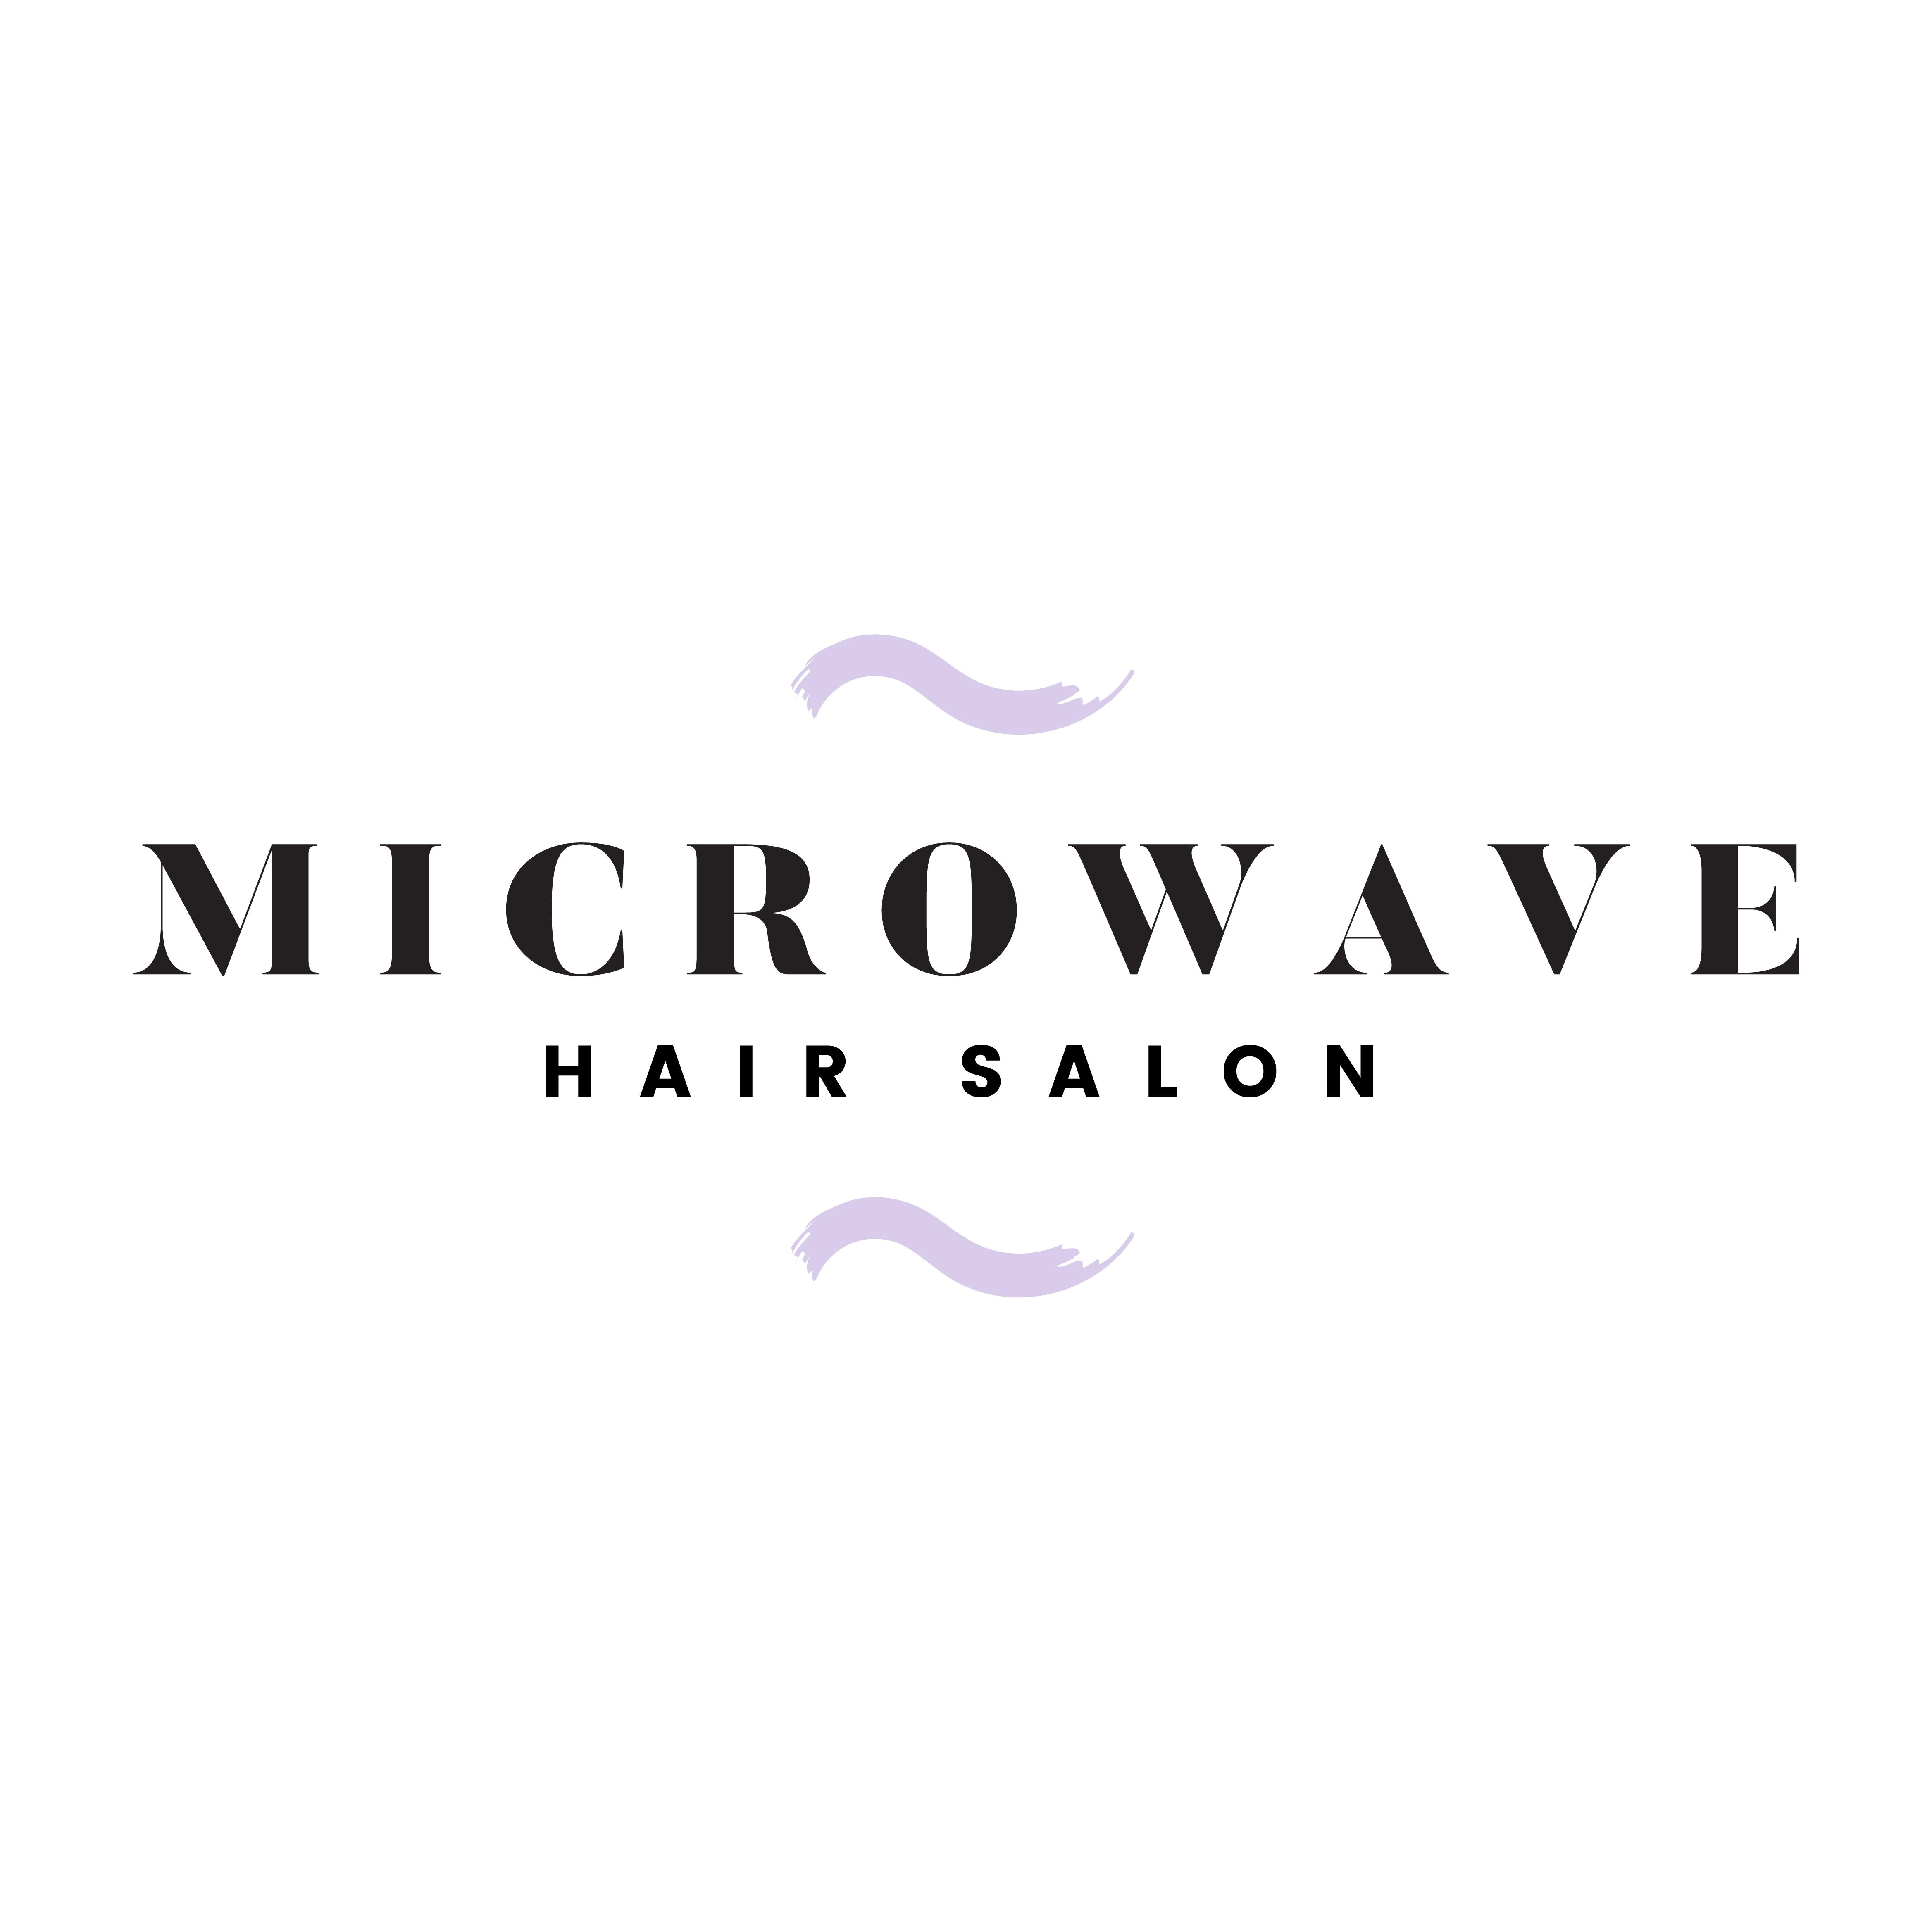 Logo With Barber Concept Design For Branding: Microwave Hair Salon Logo Vector